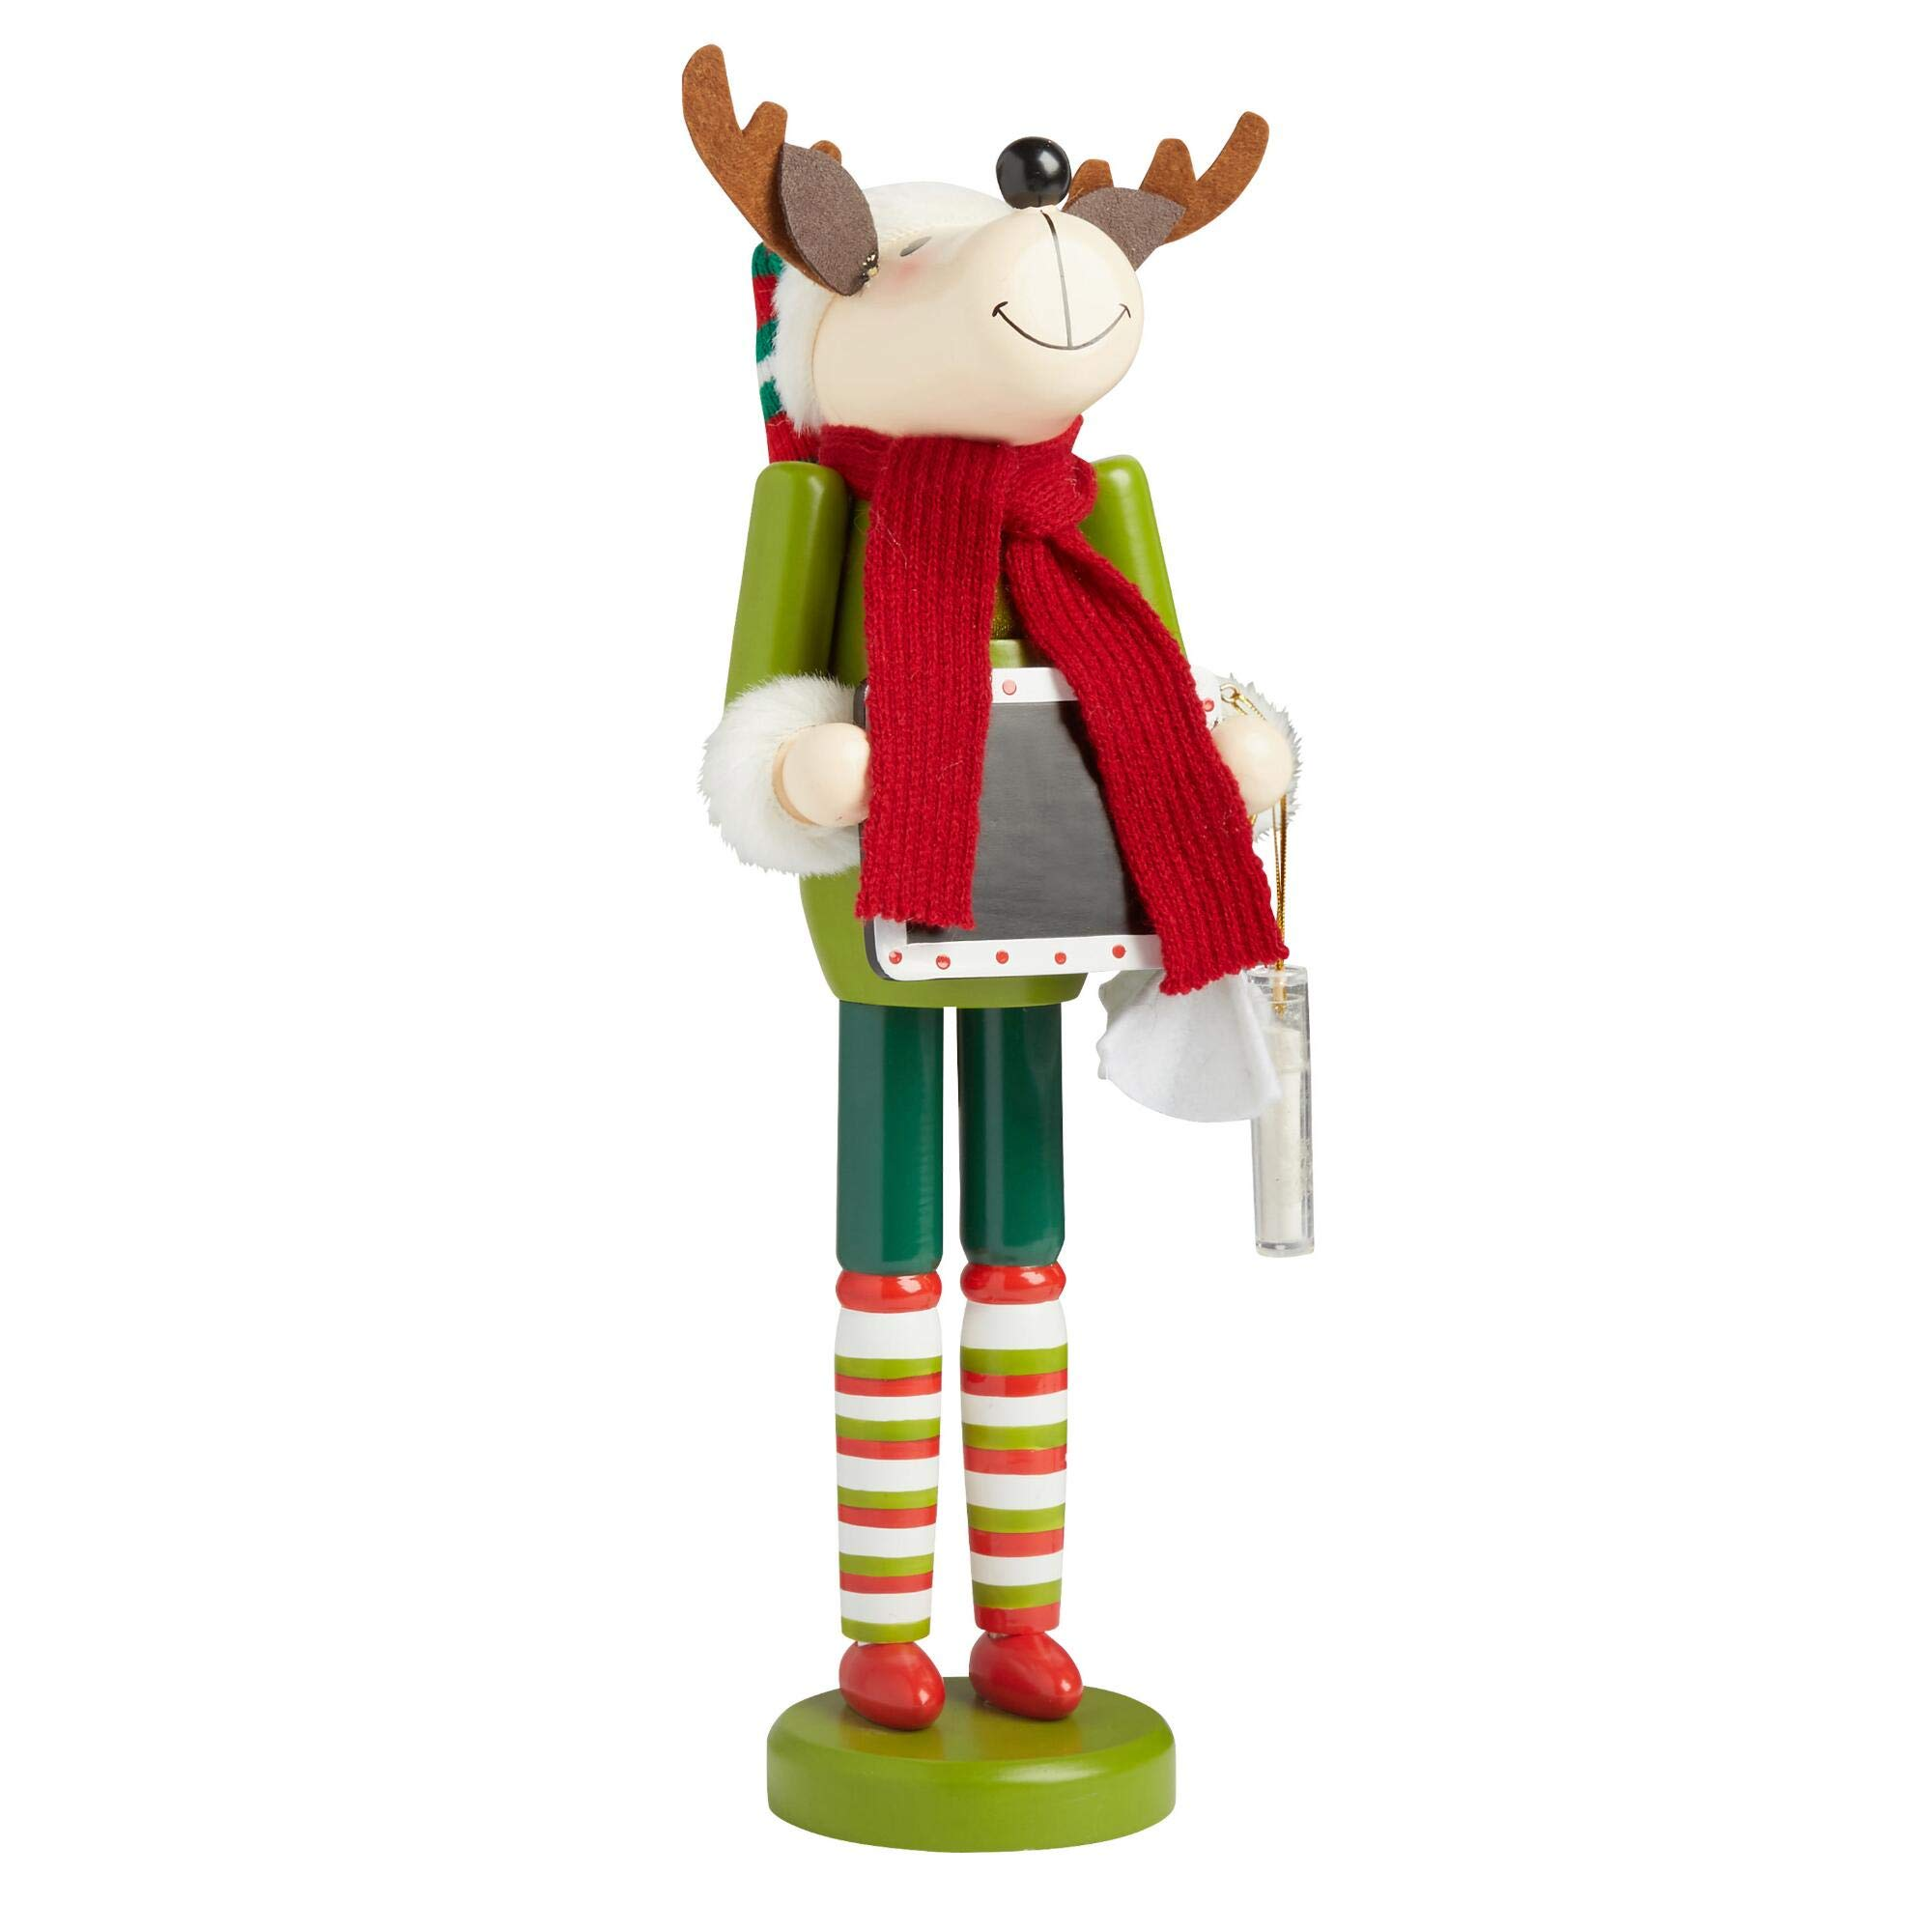 Northeast Home Goods Wooden Christmas Nutcracker Decor, 15-inch Chalkboard Reindeer